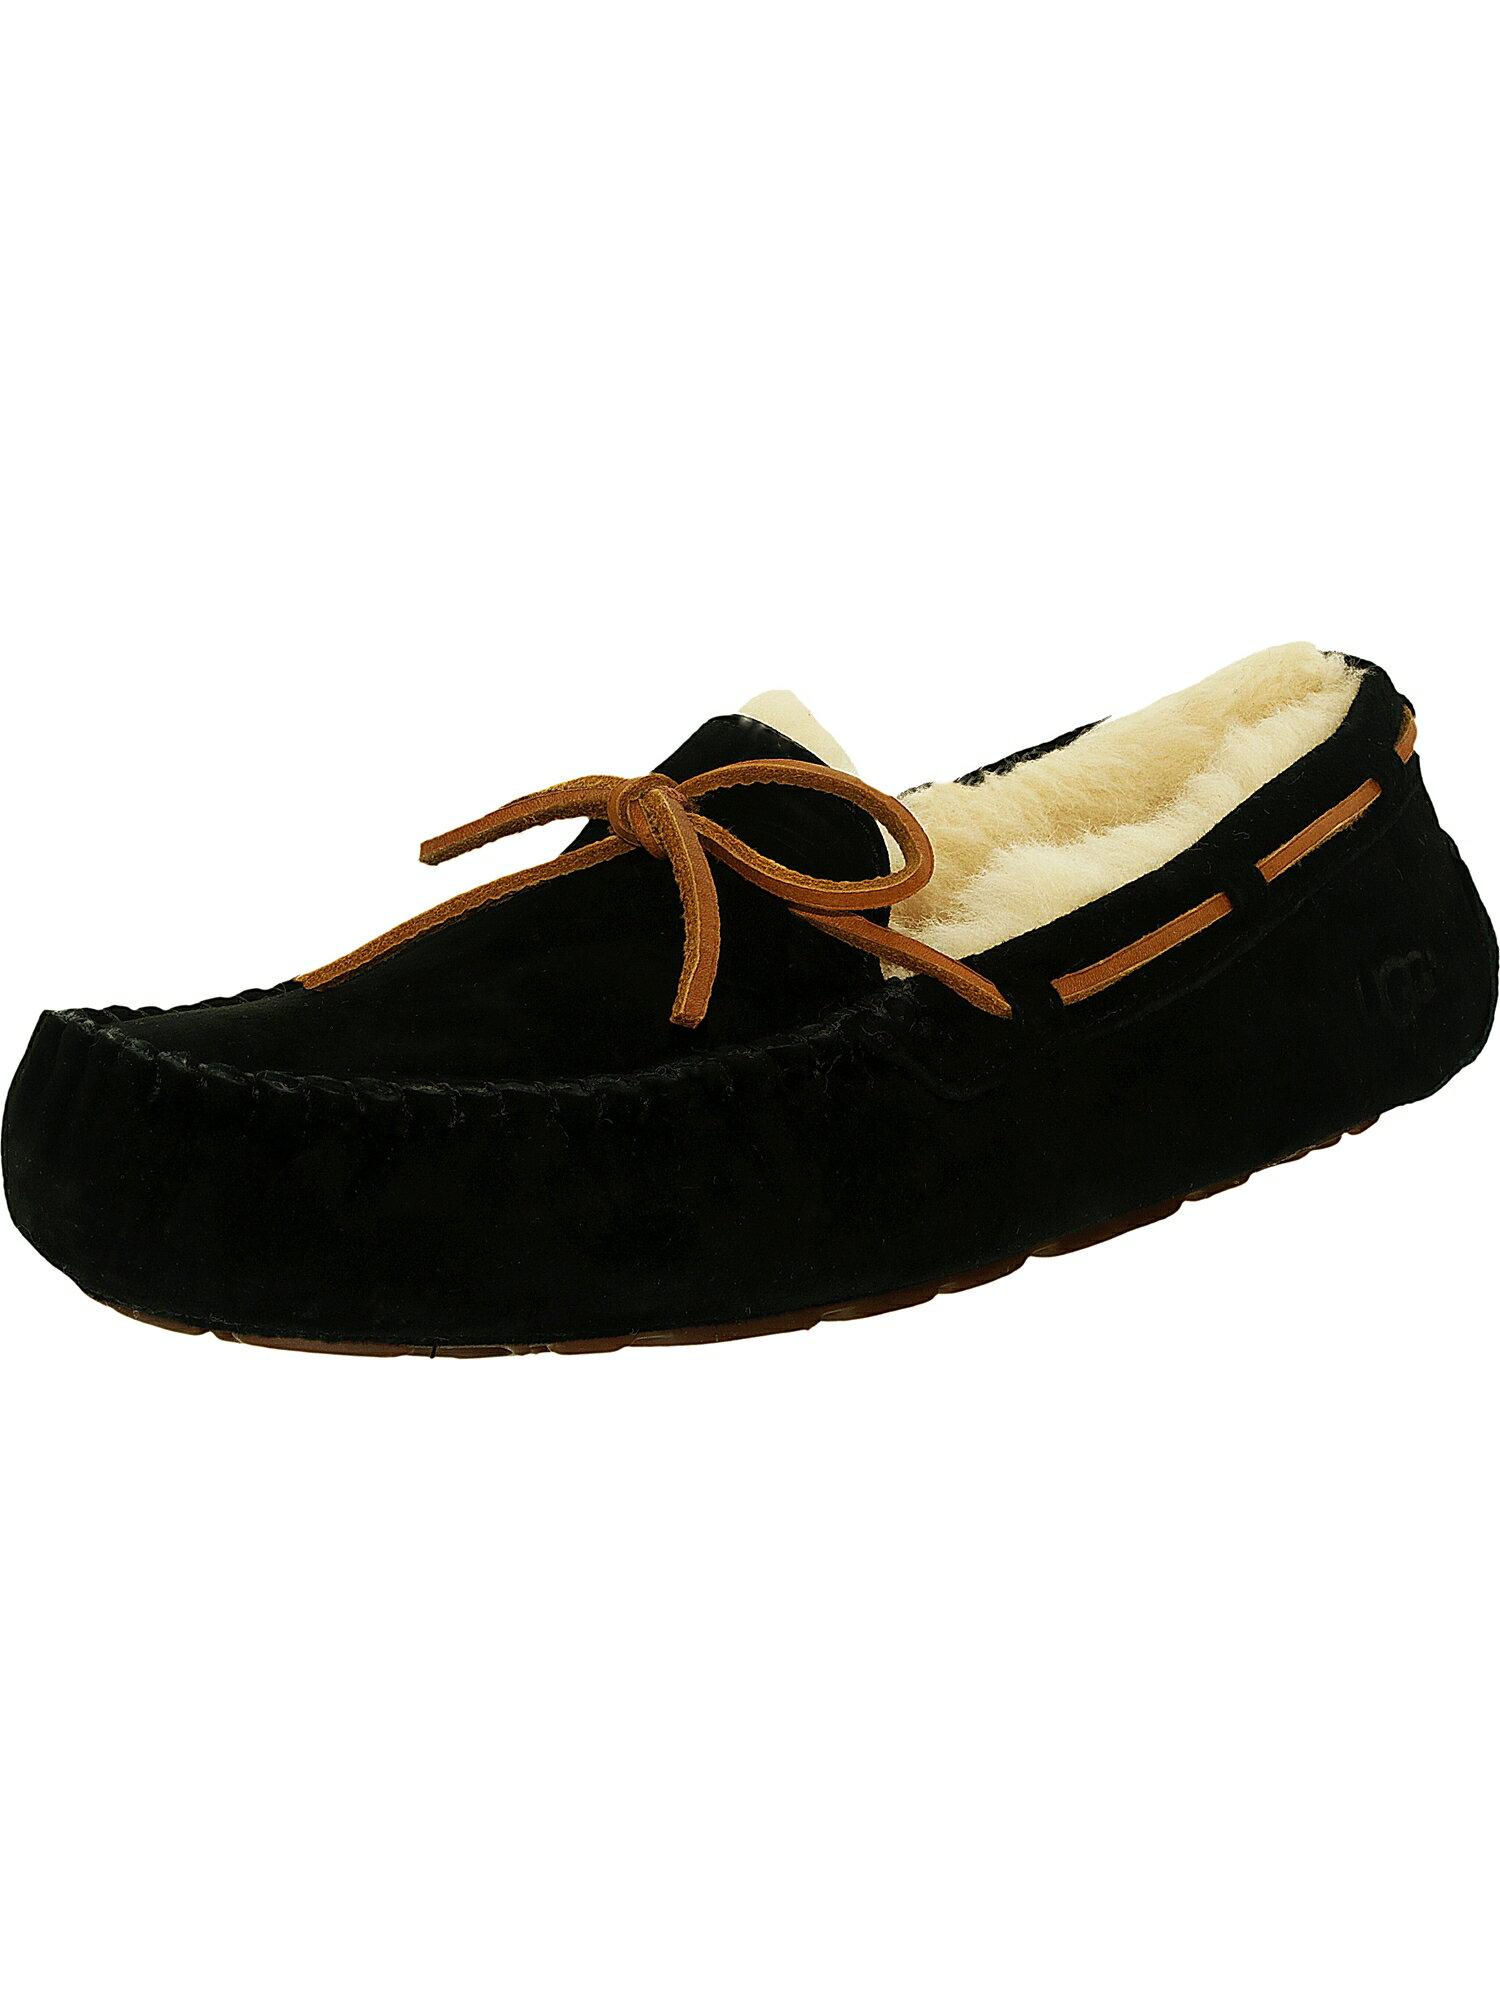 46a12b61aa5 Ugg Women's Dakota Leather Black Ankle-High Suede Slipper